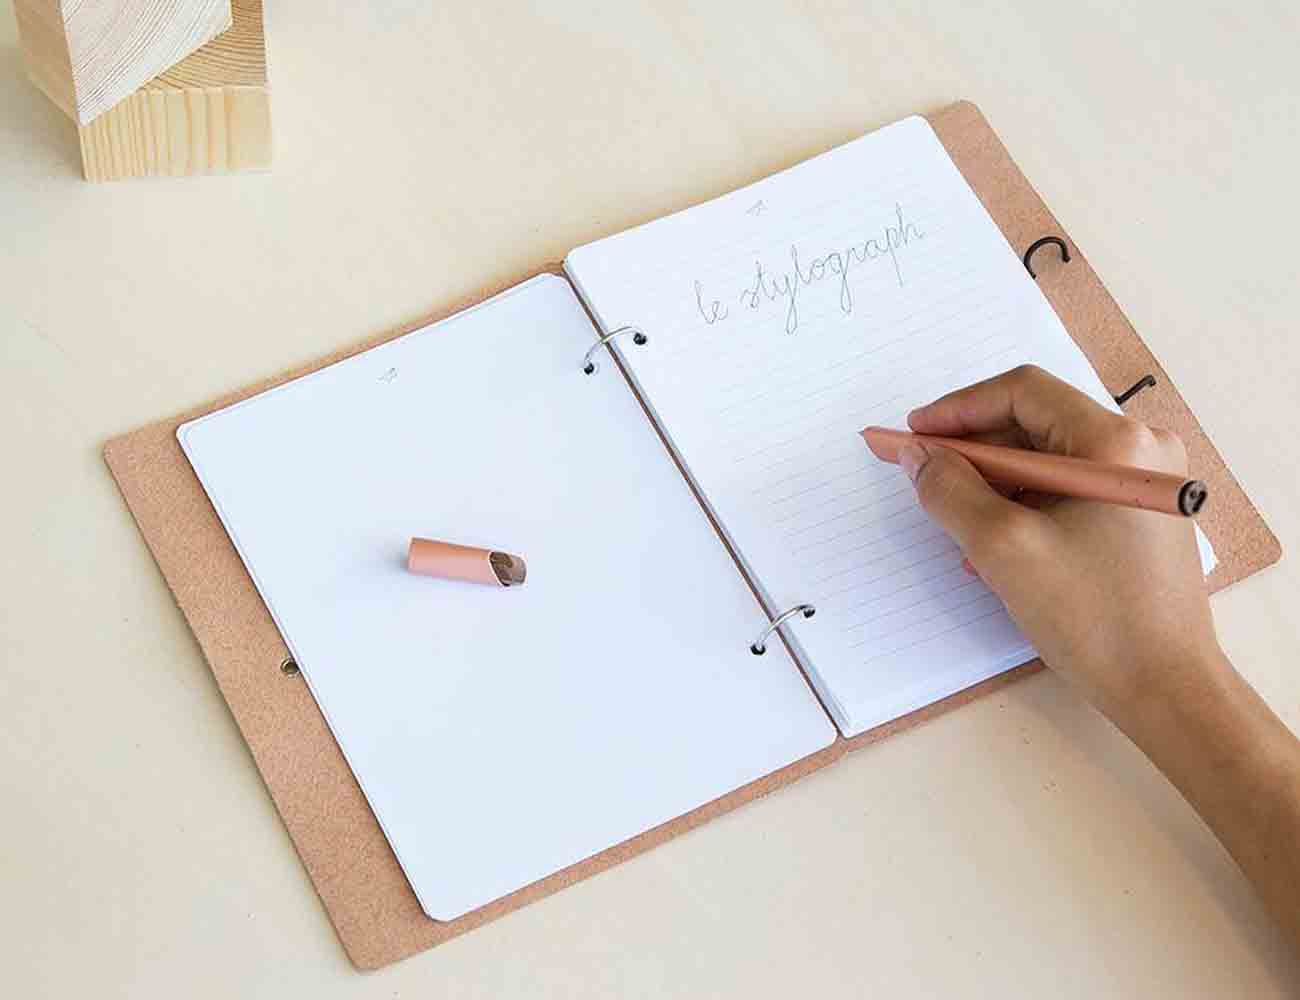 Stylograph Smart Pen